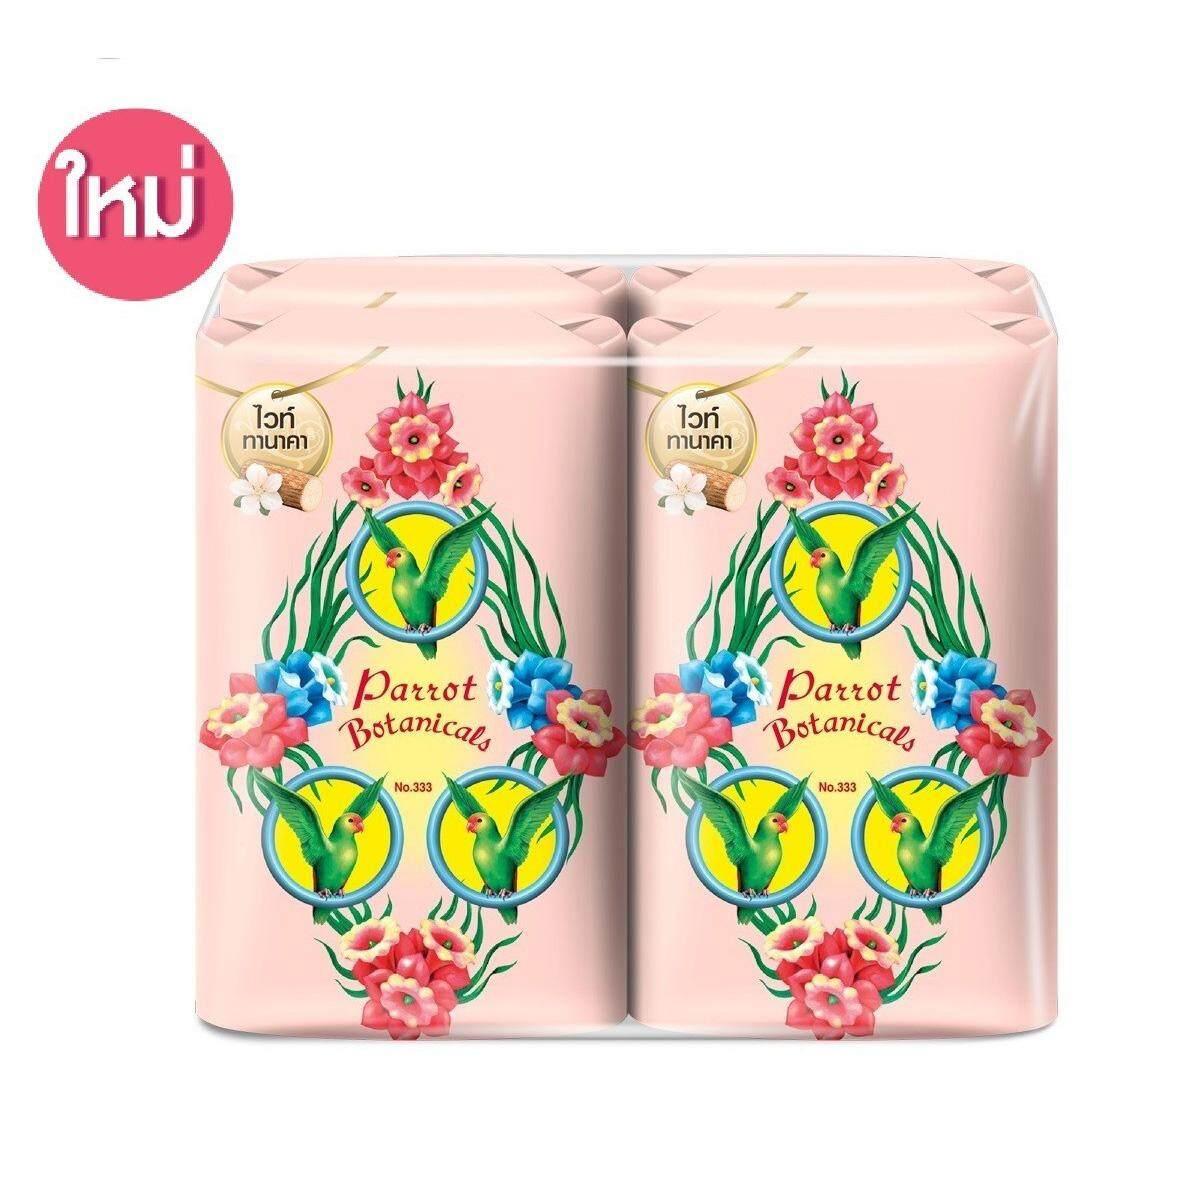 Parrot สบู่พฤกษานกแก้ว 70 กรัม ไวท์ ทานาคา แพ็ค 4 ก้อน Parrot Bar Soap Thai White Thanaka 70 g. Pack 4 (Soap, Body Wash, Body Soap, สบู่,สบู่อาบน้ำ) ของแท้